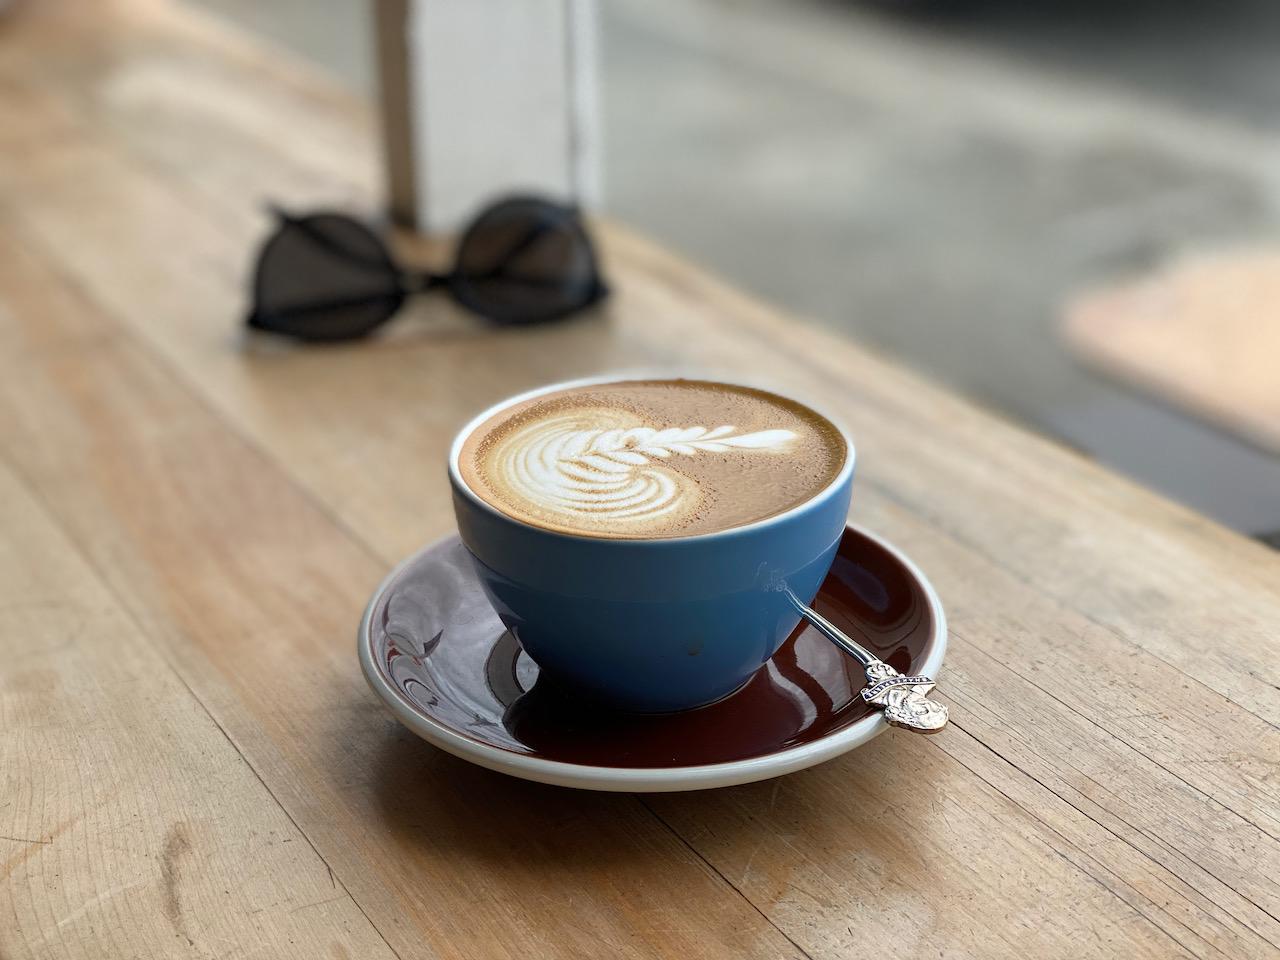 Neuseeländische Kaffeepause in Amberley, Canterbury, Neuseeland (23.12.2019)